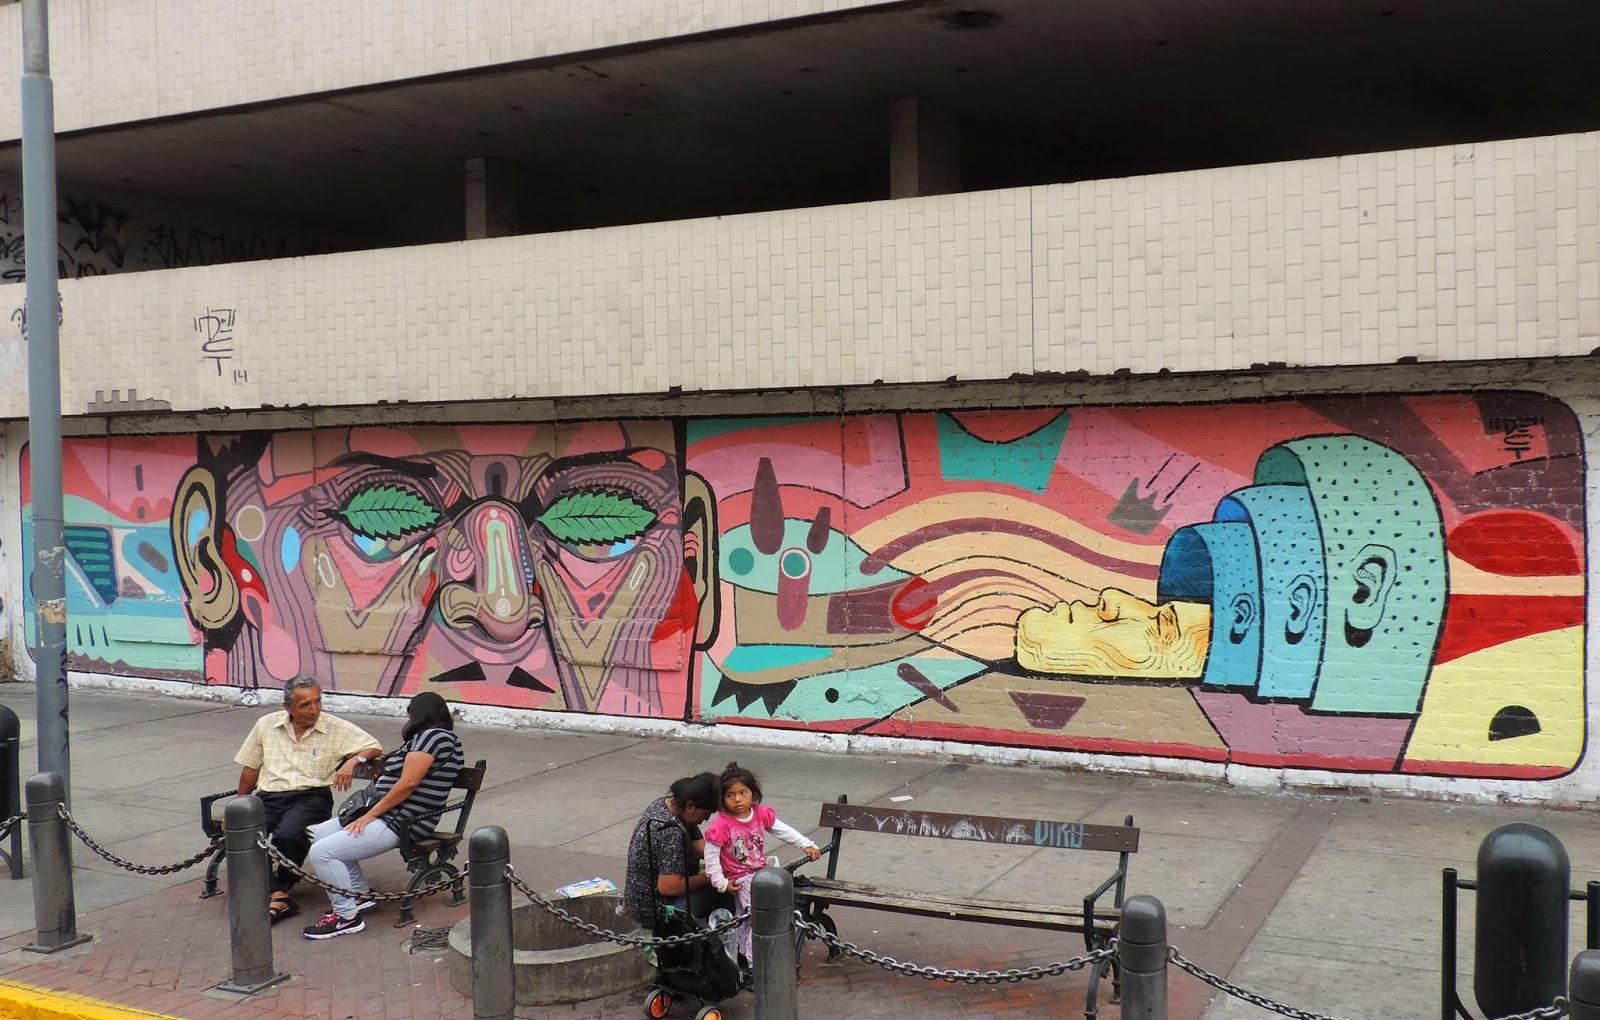 New Mural by Daniel Cortez aka El Decertor on the streets of Lima, Peru. 1